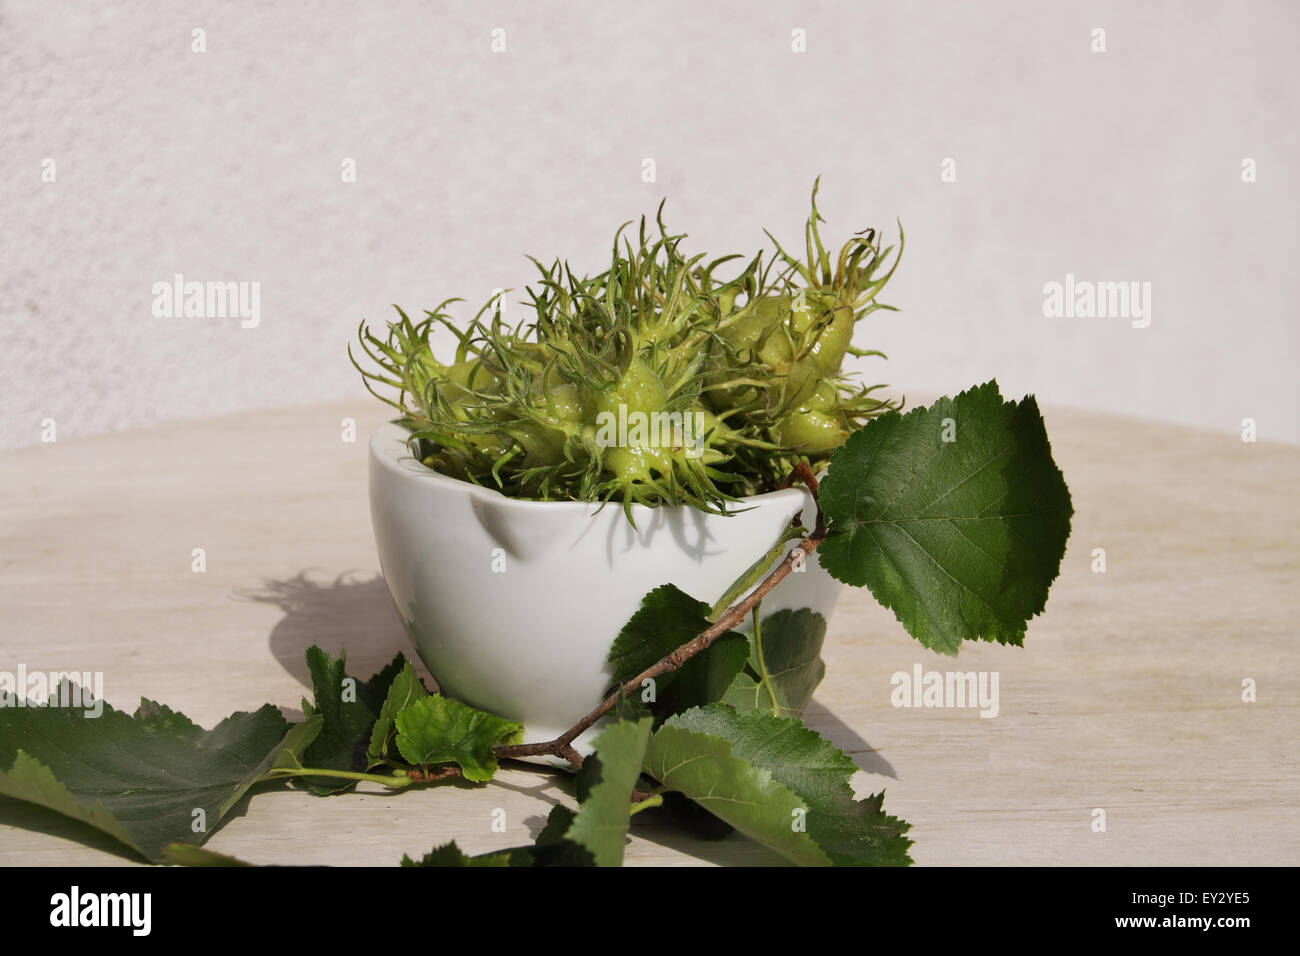 Hazel nut fruits in a white bowl on white backdrop - Stock Image